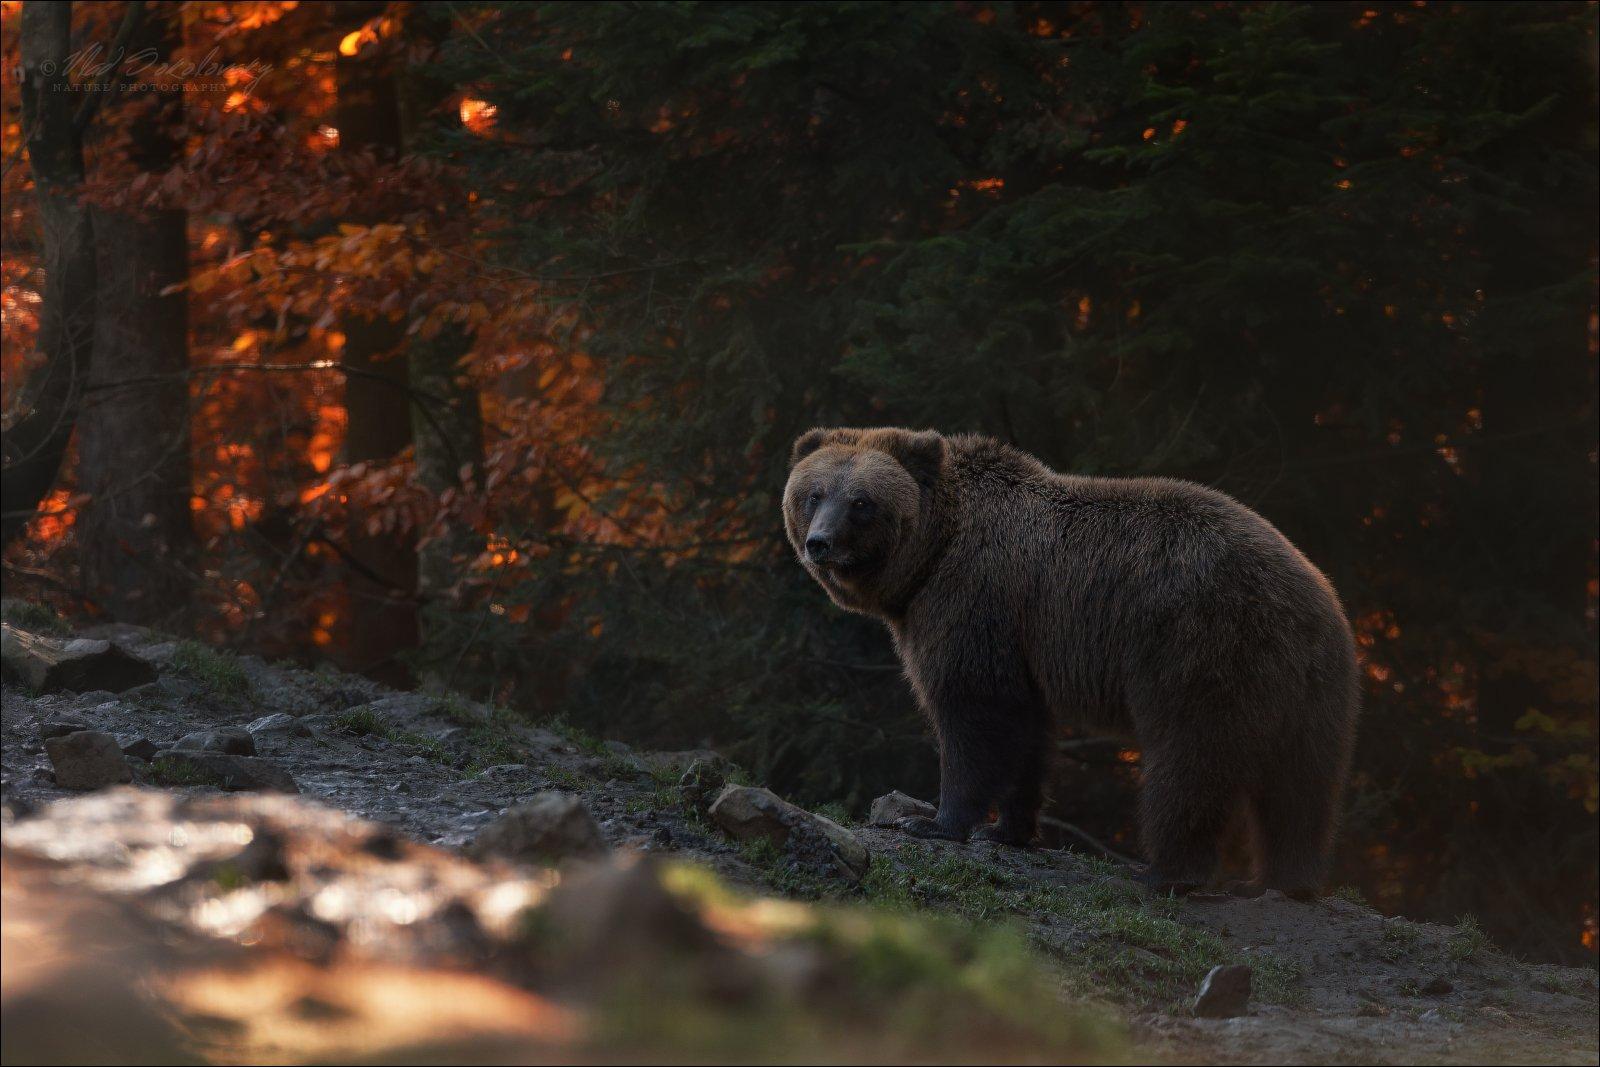 карпаты, синевир, бурый медведь, центр реабилитации бурого медведя, осень, bear, Влад Соколовский